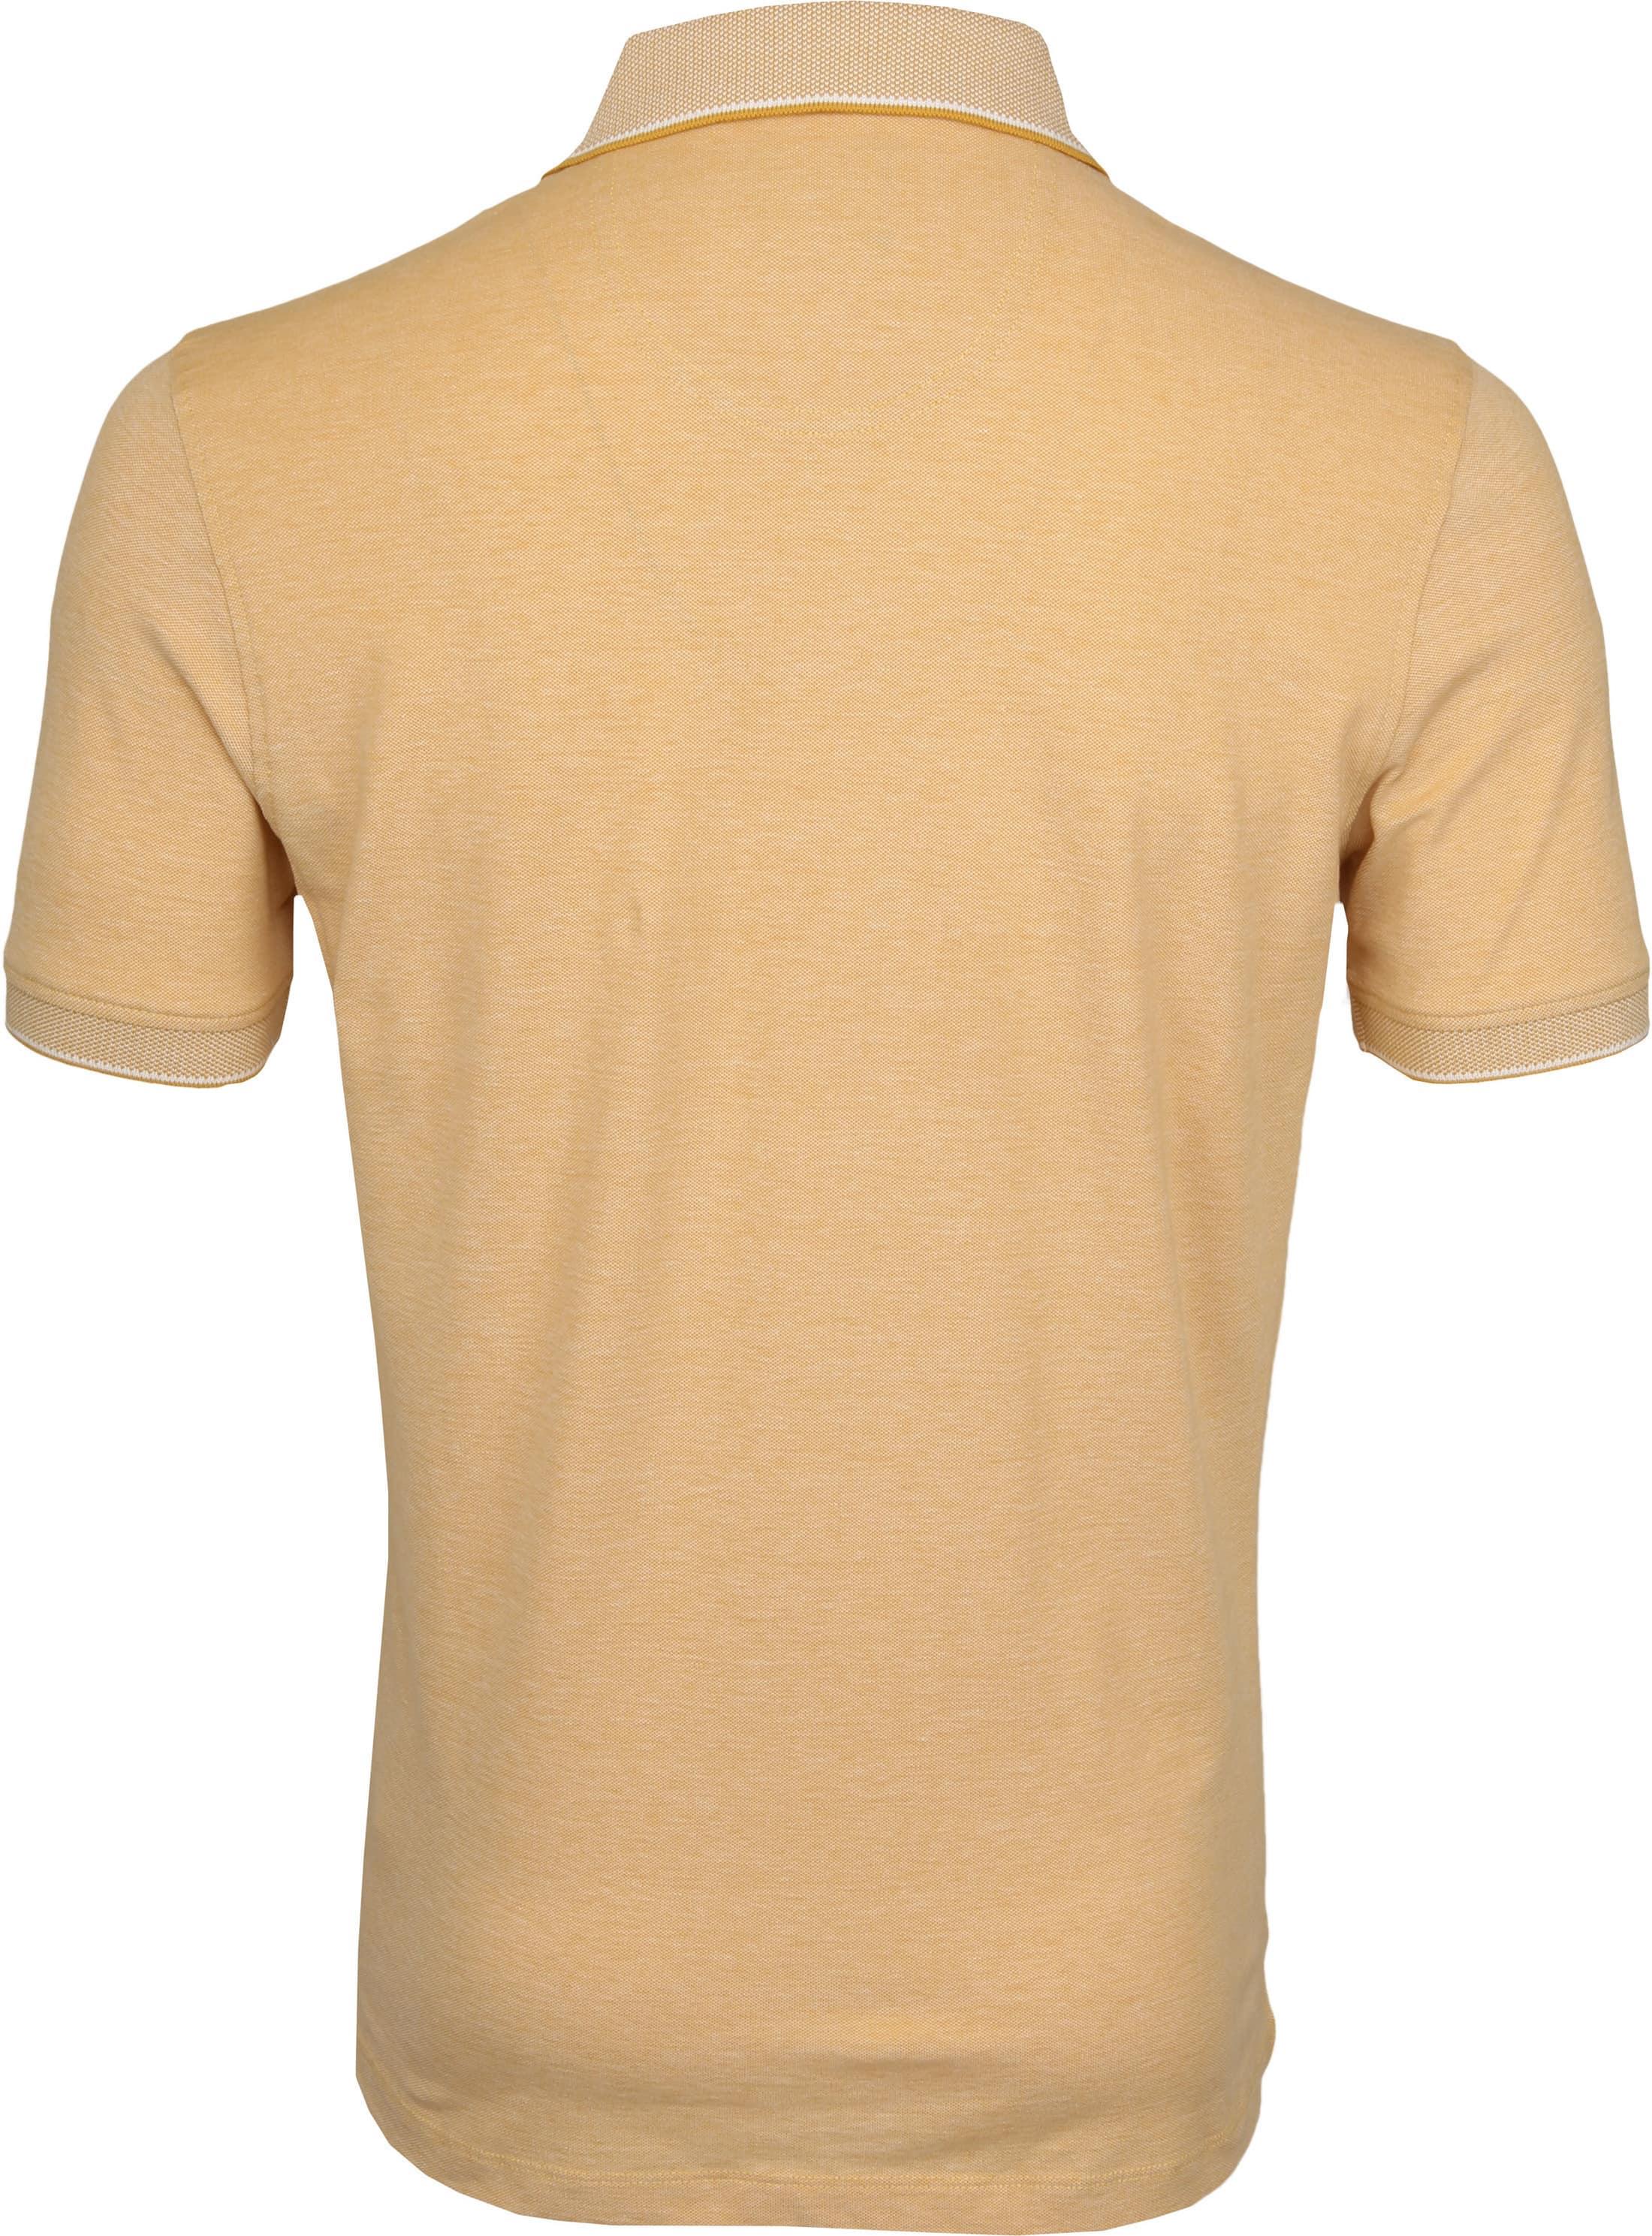 Suitable Melange Poloshirt Yellow foto 3